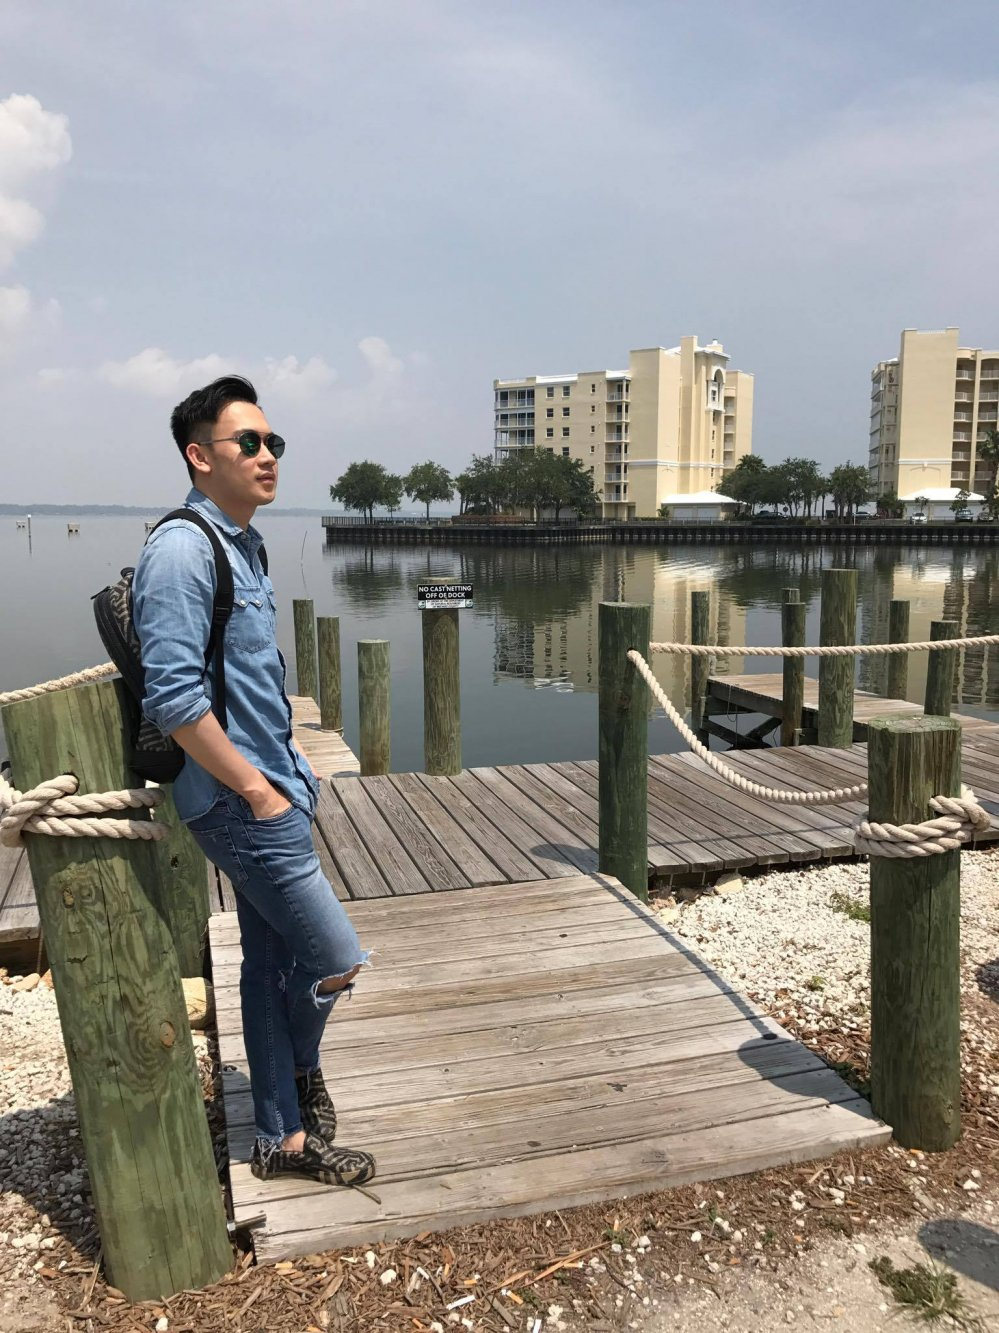 '14 nam 9 thang' cua Duong Trieu Vu ky niem cung Dam Vinh Hung gay sot hinh anh 2